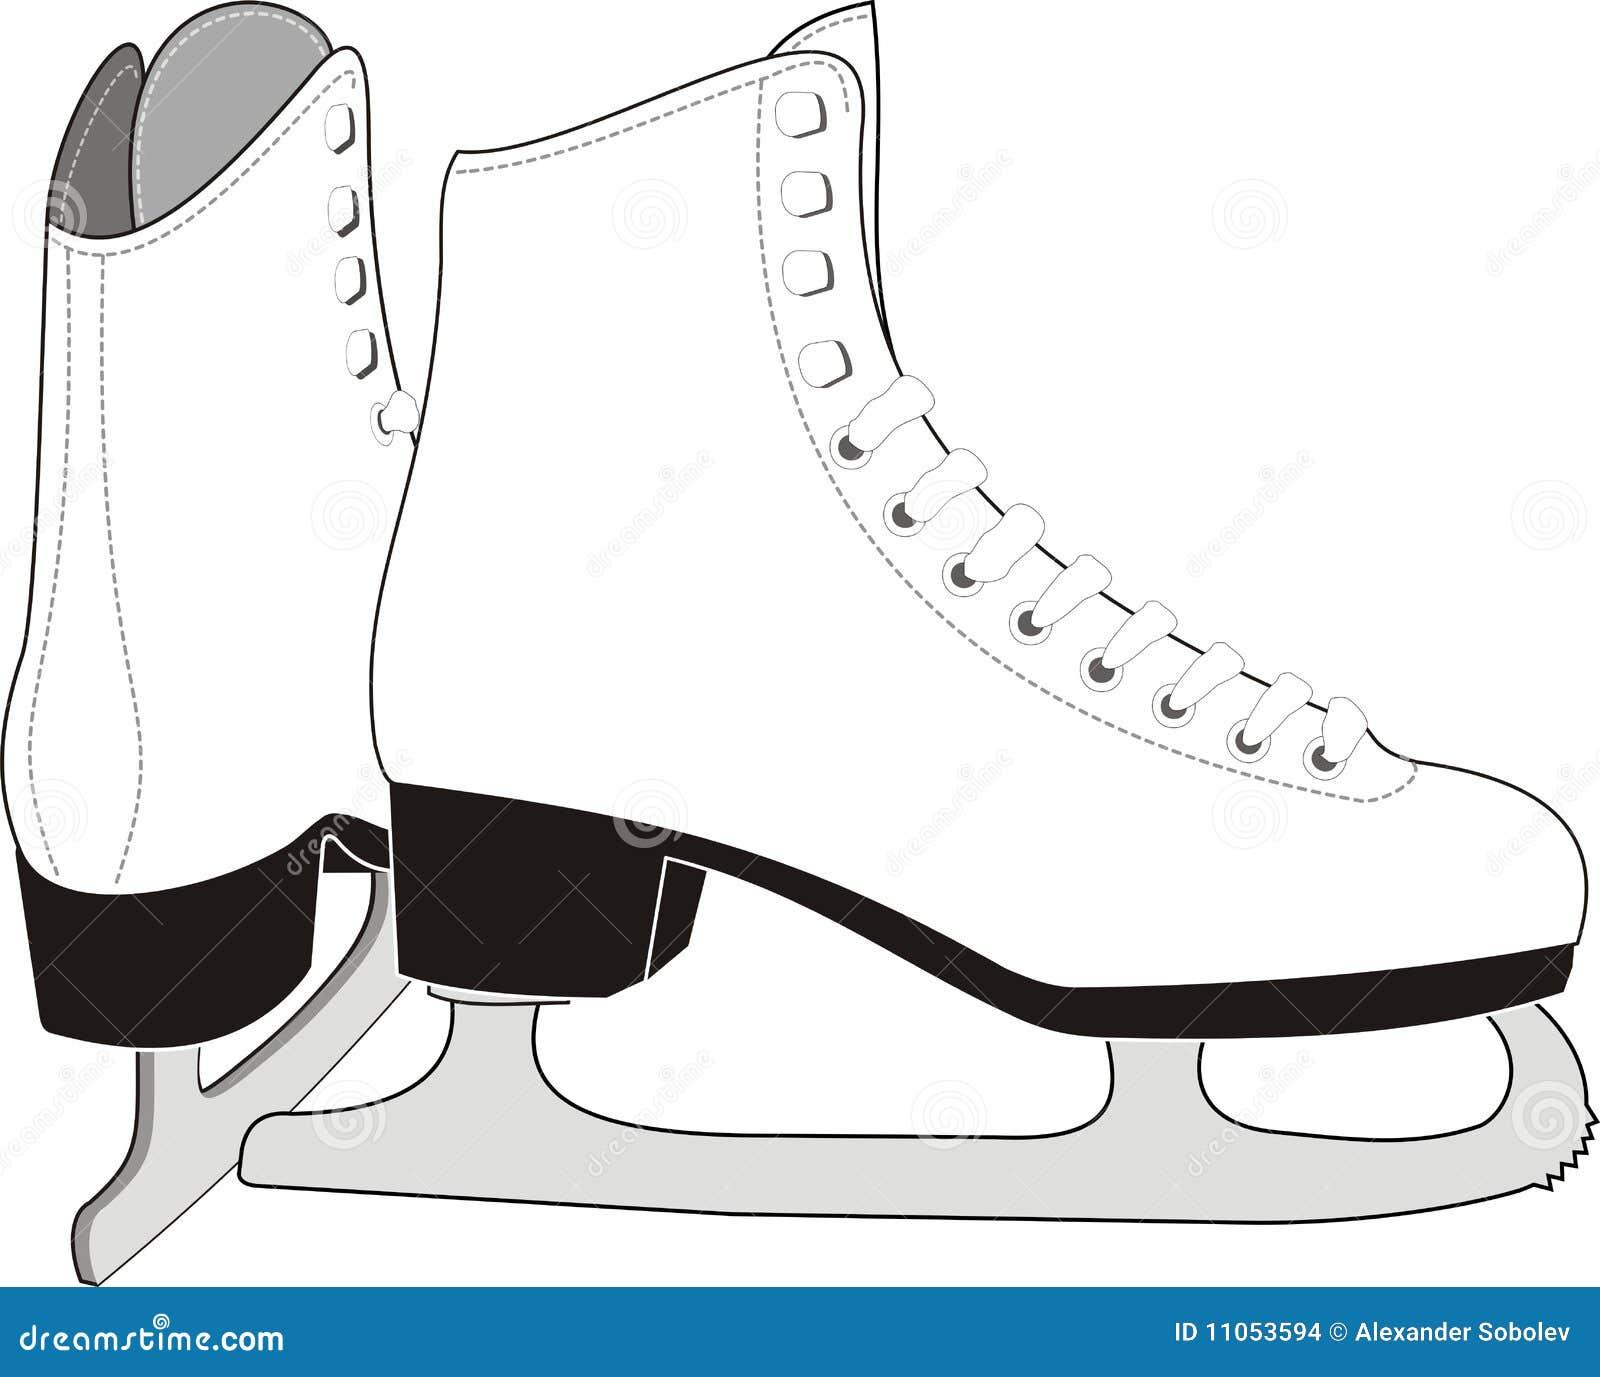 Lady's Ice Skates